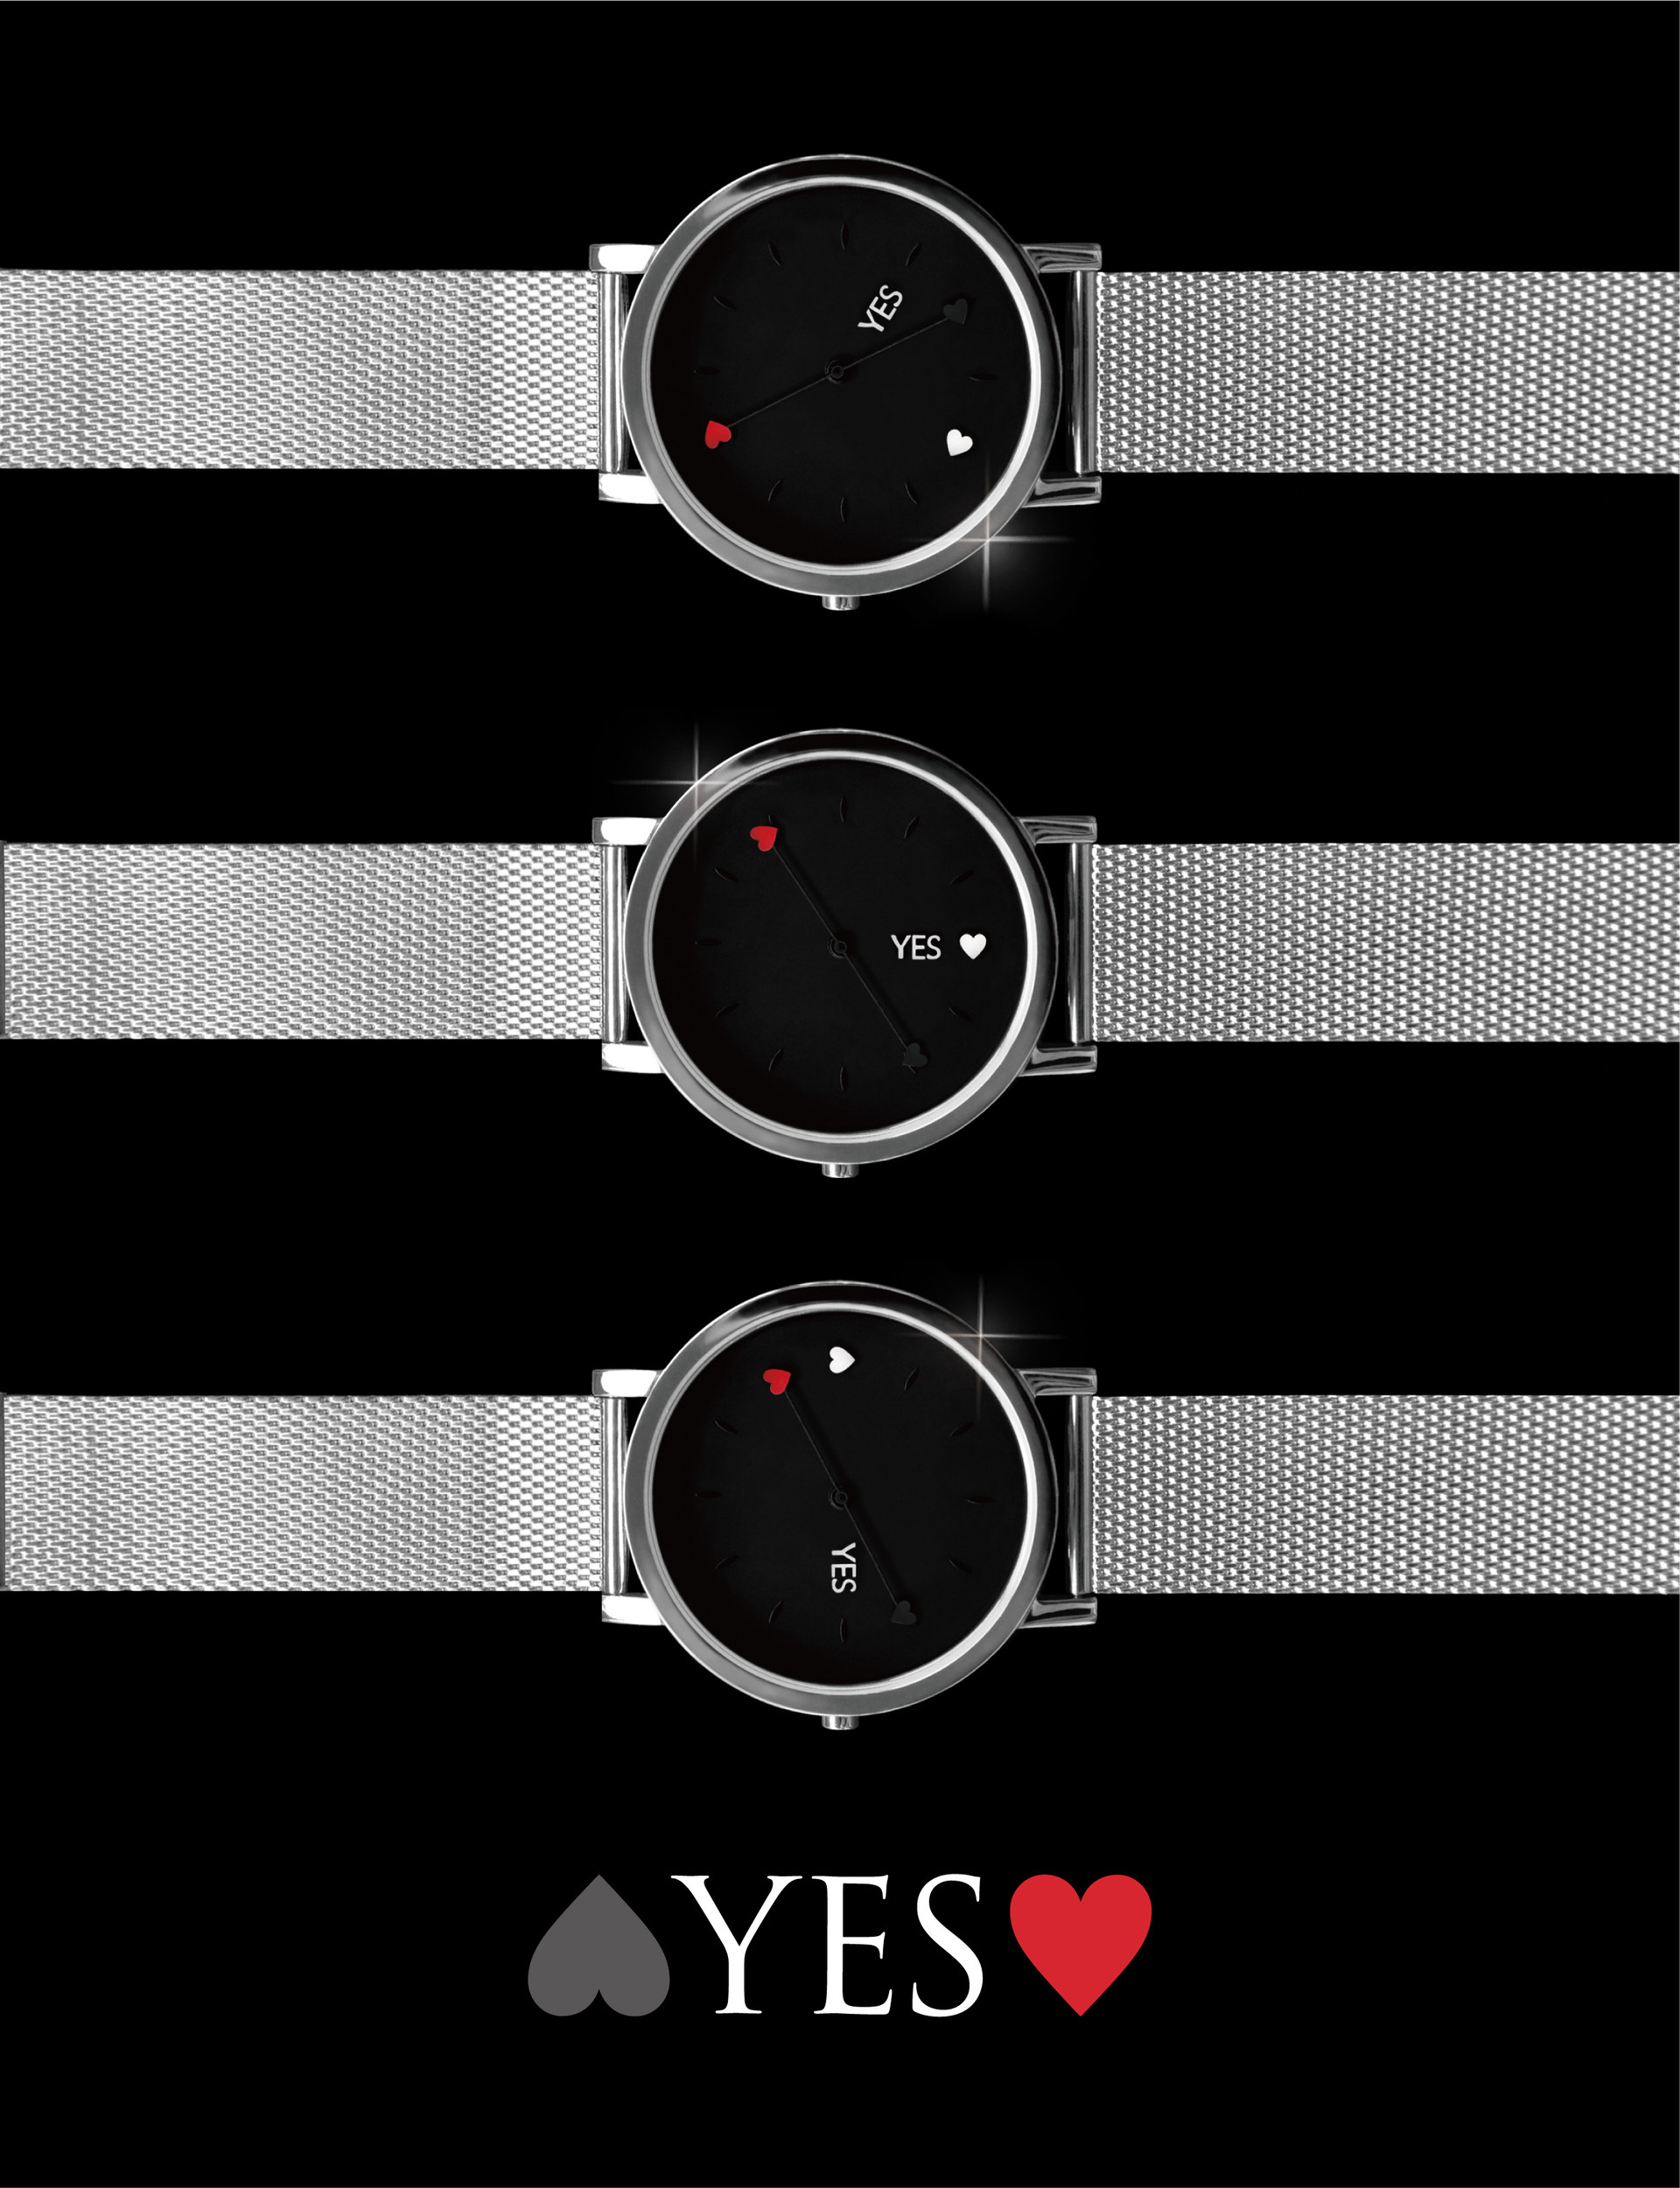 Yeslove-1.jpg